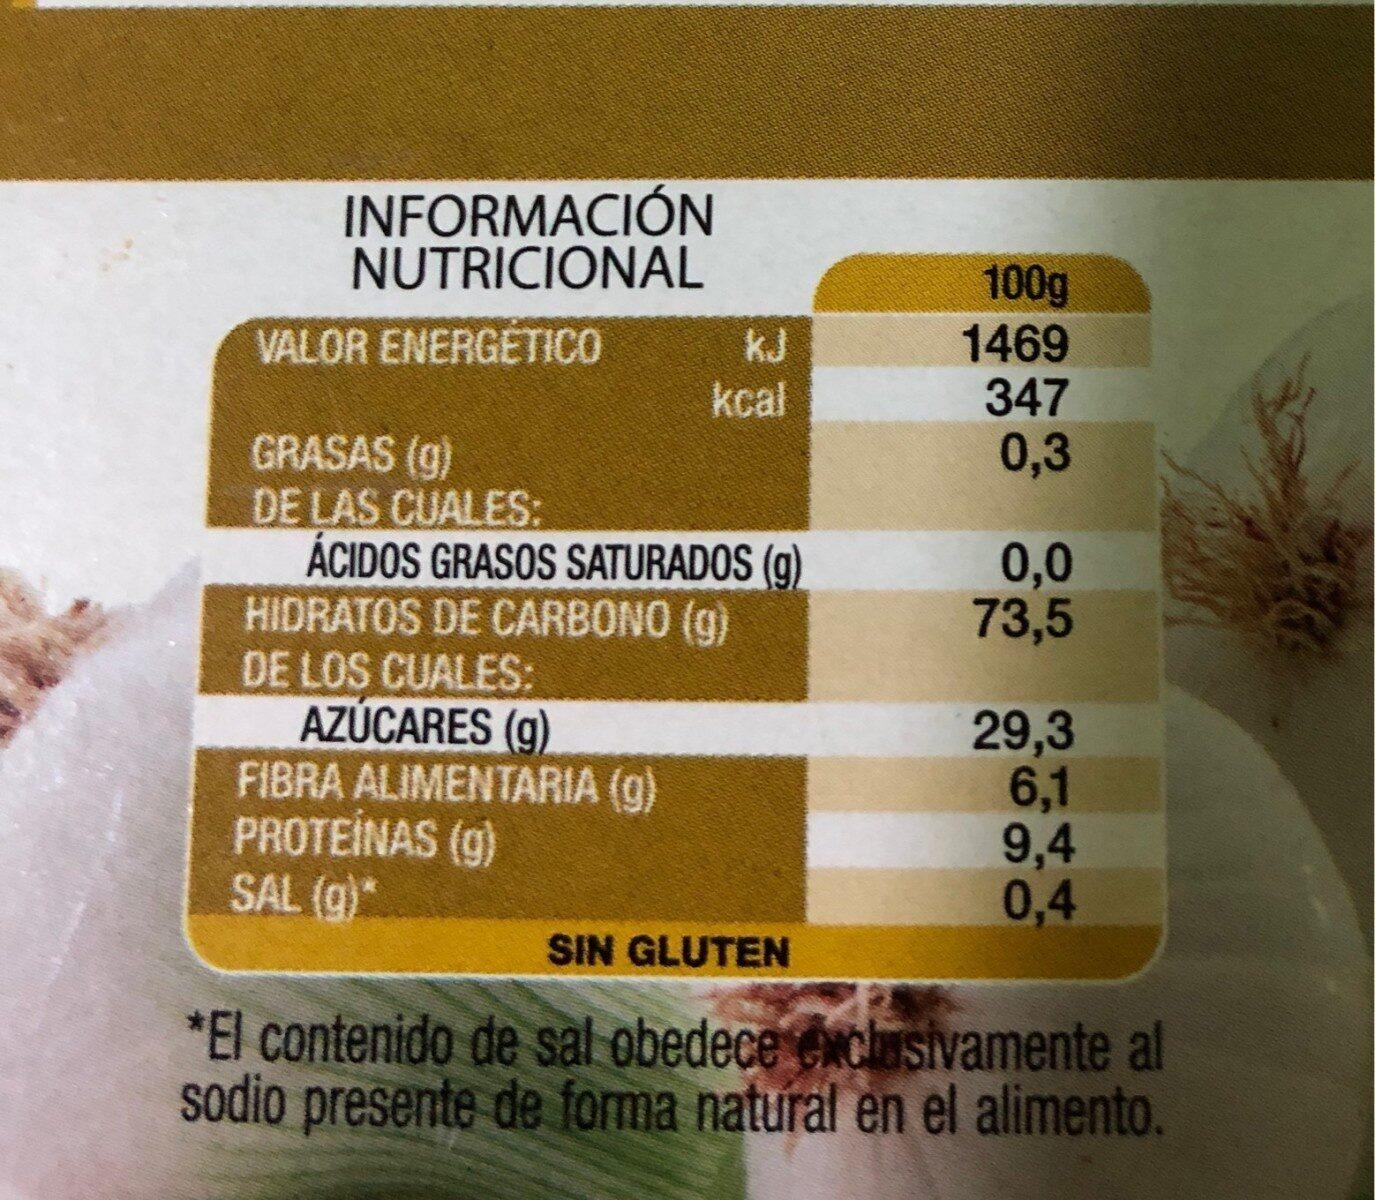 Cebolla deshidratada - Informació nutricional